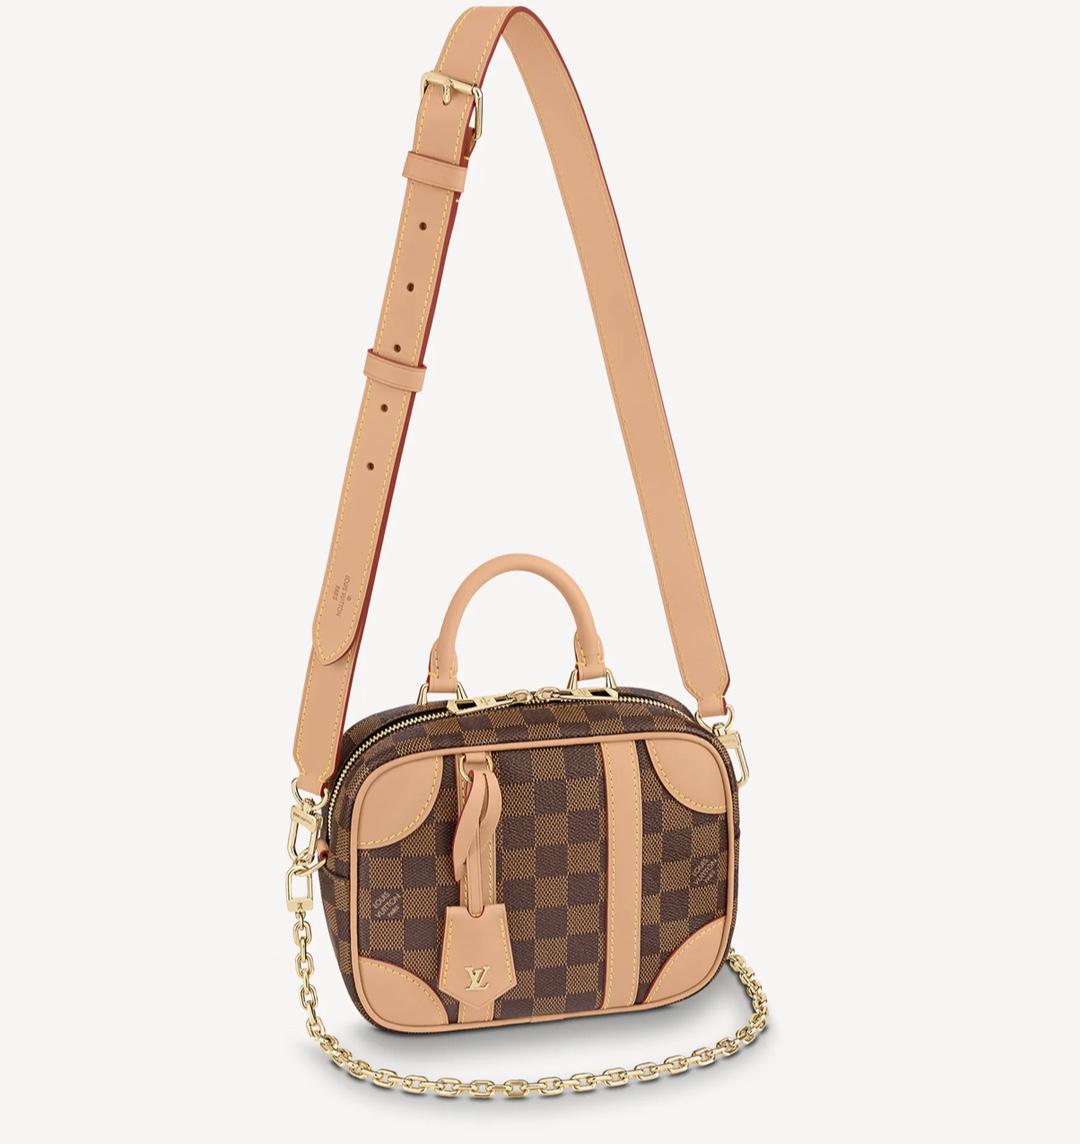 Replica Louis Vuitton N50065 Valisette Souple BB Handbag Damier Ebene Coated Canvas Natural Beige